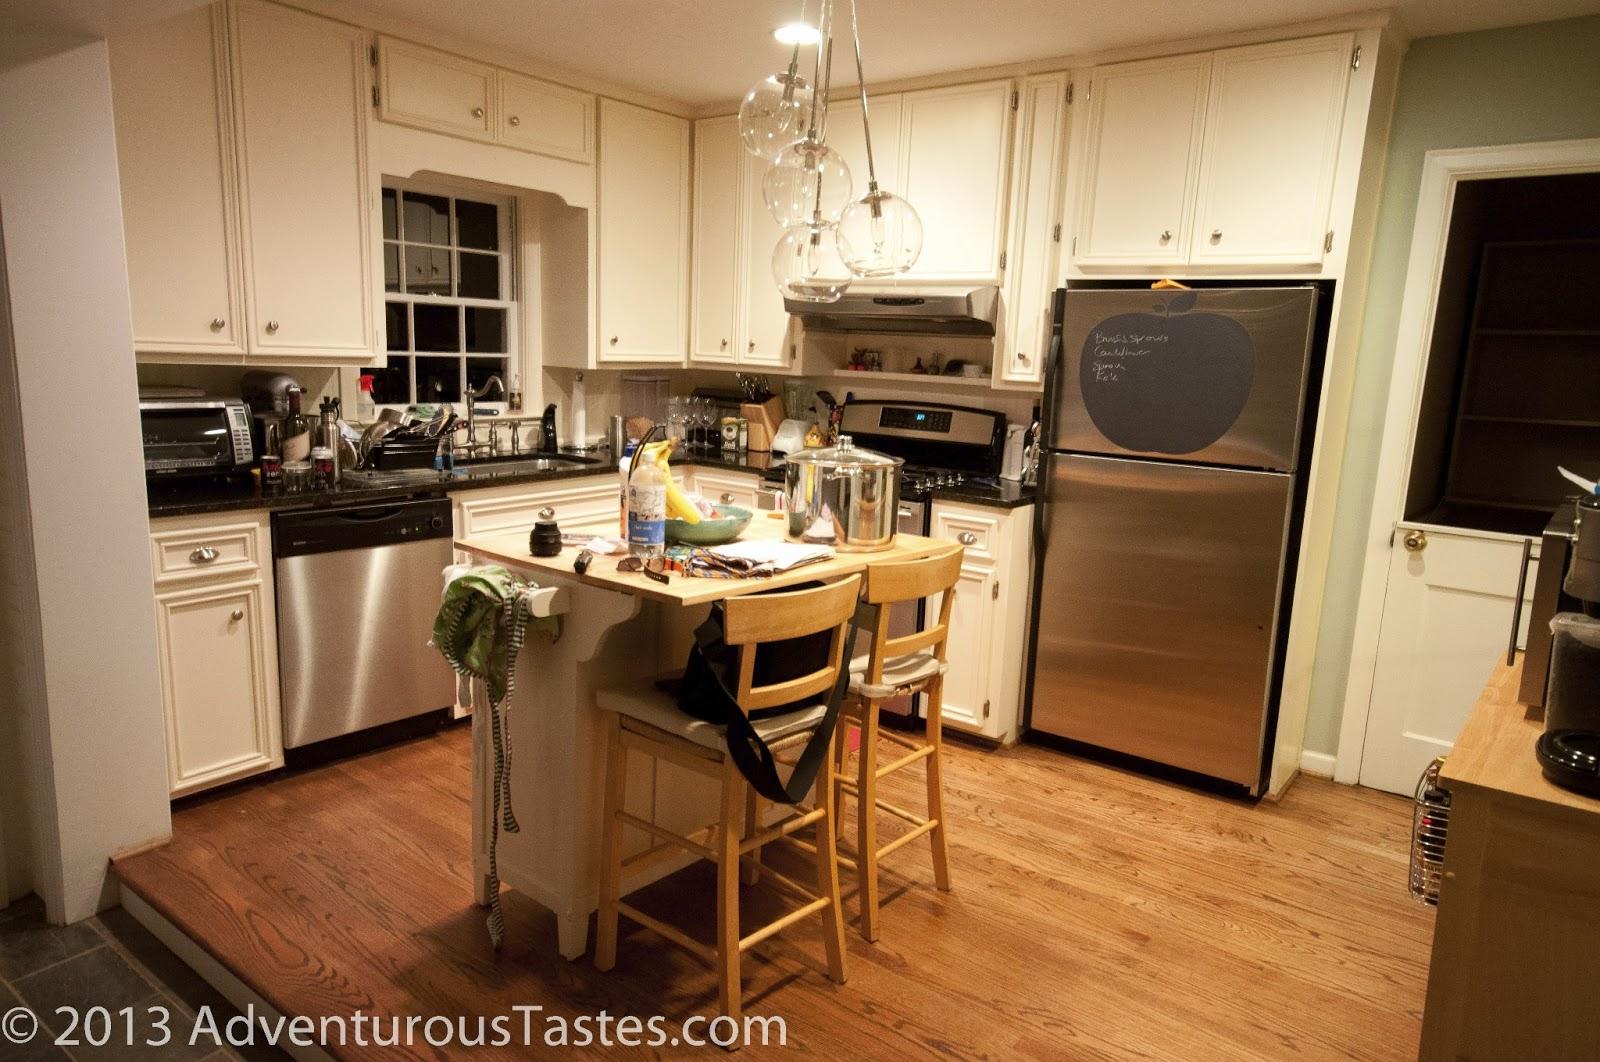 Average Kitchen Backsplash Dimensions